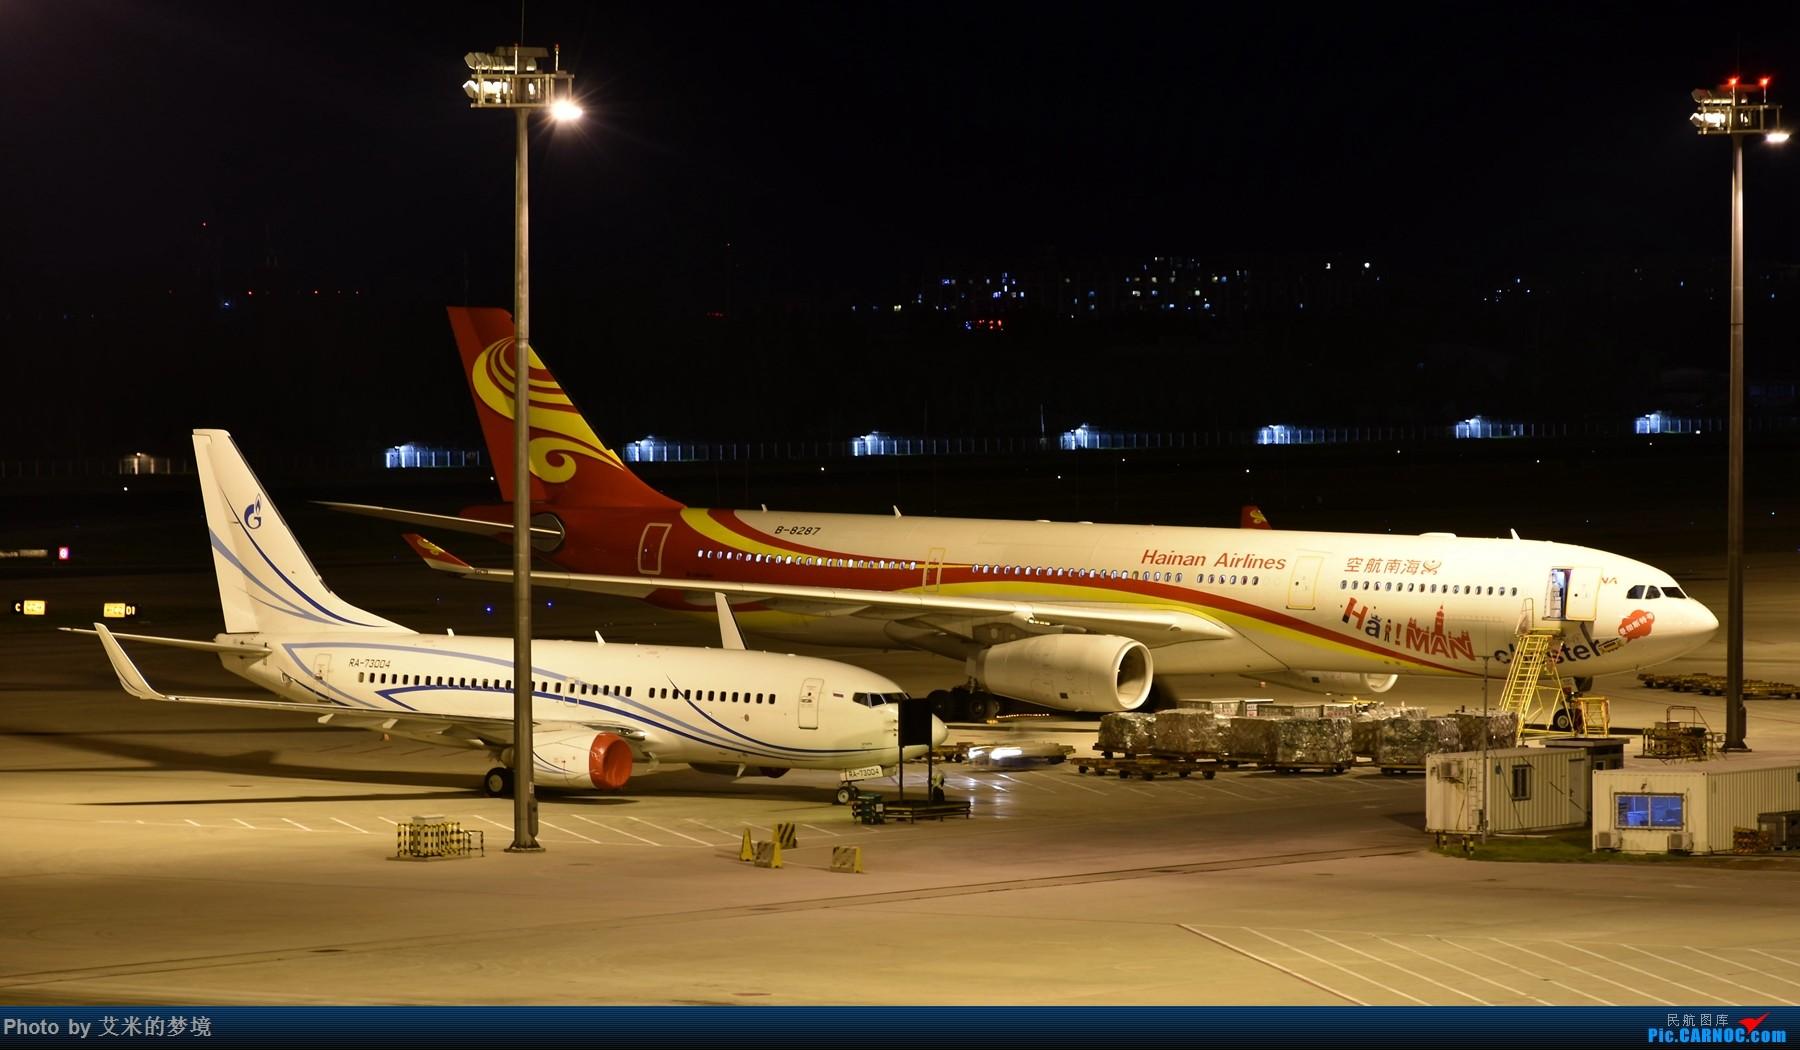 Re:[原创]【carnoc重庆飞友会】北京送行,所见飞行 AIRBUS A330-300 B-8287 中国北京首都国际机场